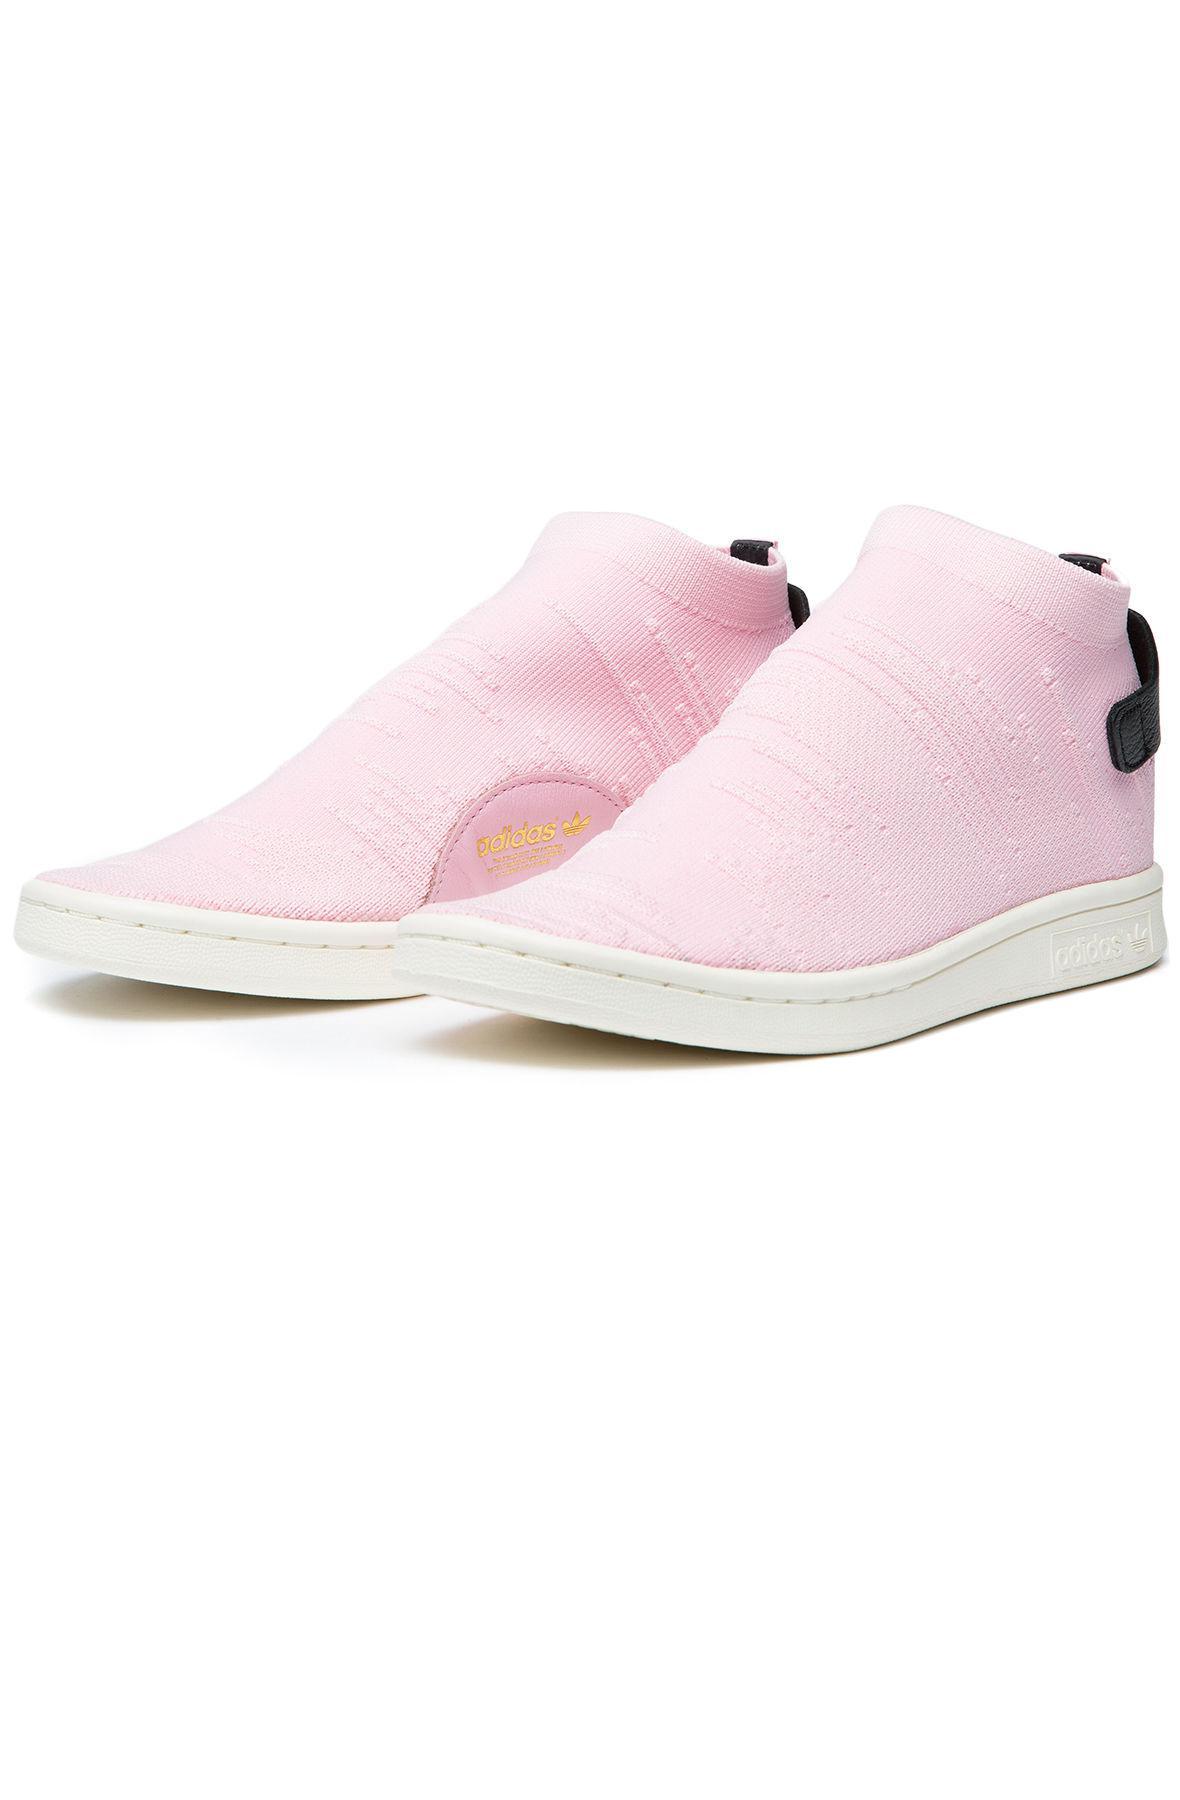 Lyst - adidas The Stan Smith Sock Primeknit Women s In Wonder Pink ... 8e160f81e7